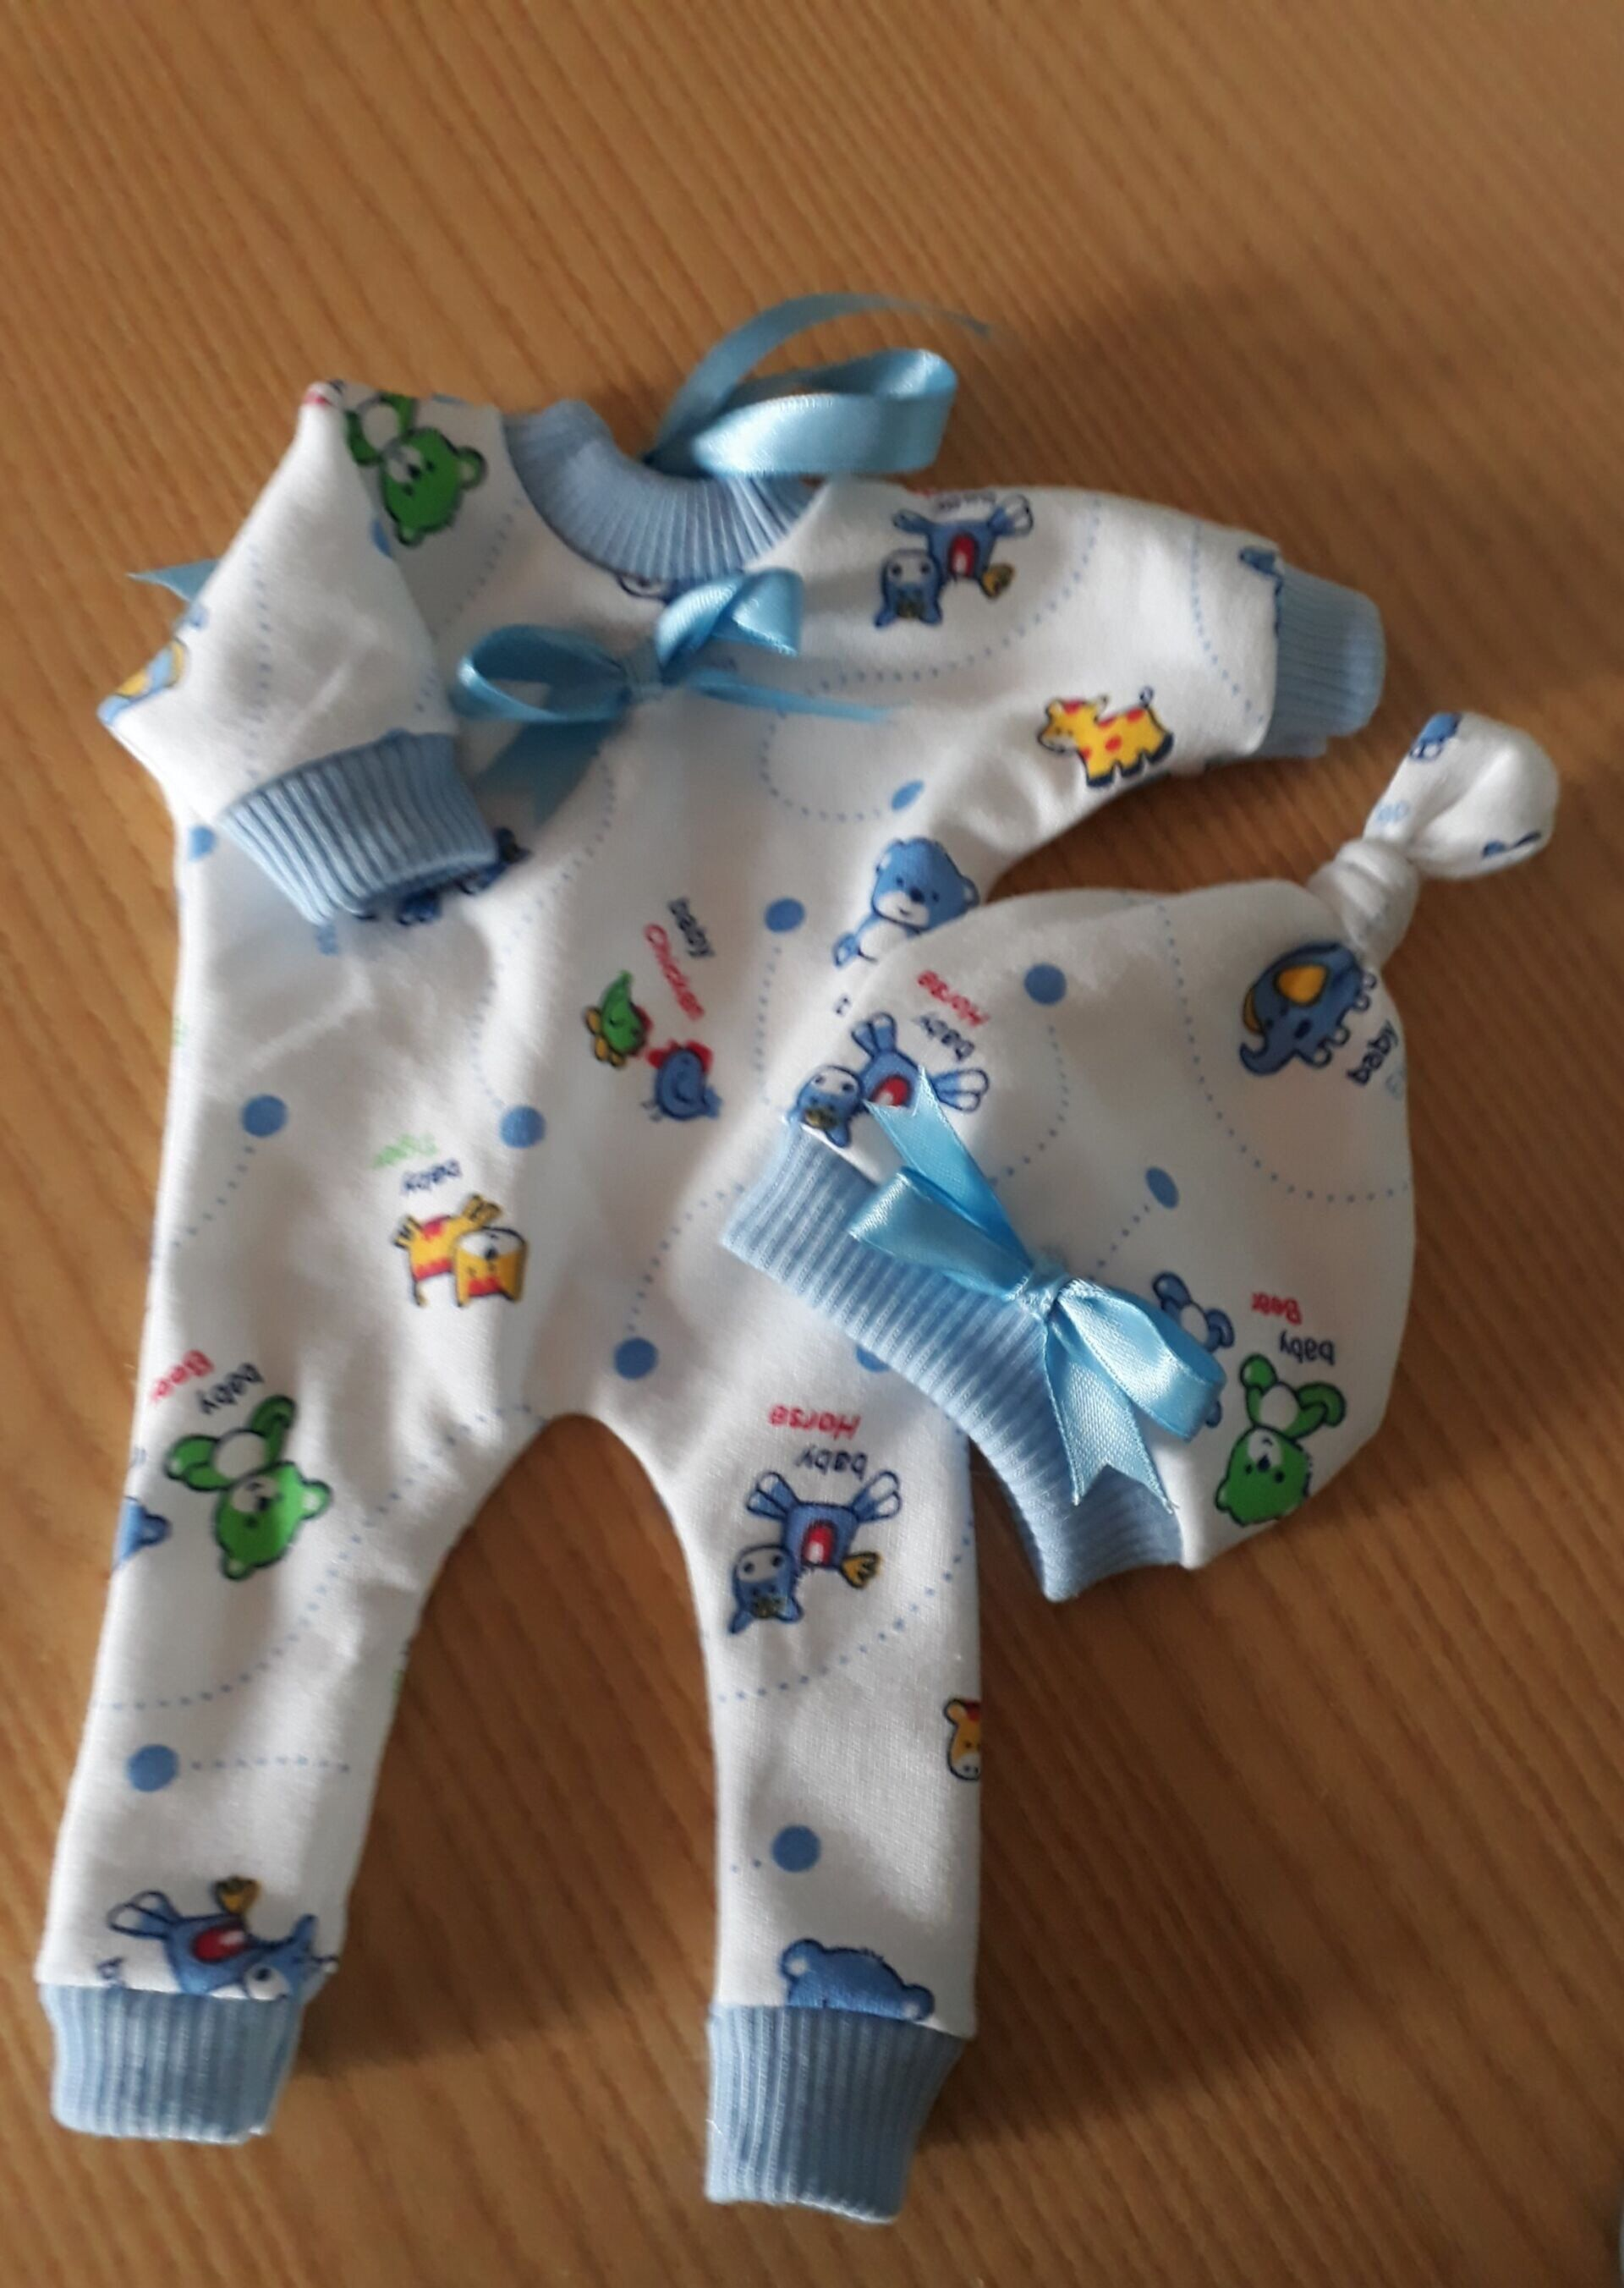 premature stillborn baby clothes bereavement rompersuit sert born 24 weks04/12/20